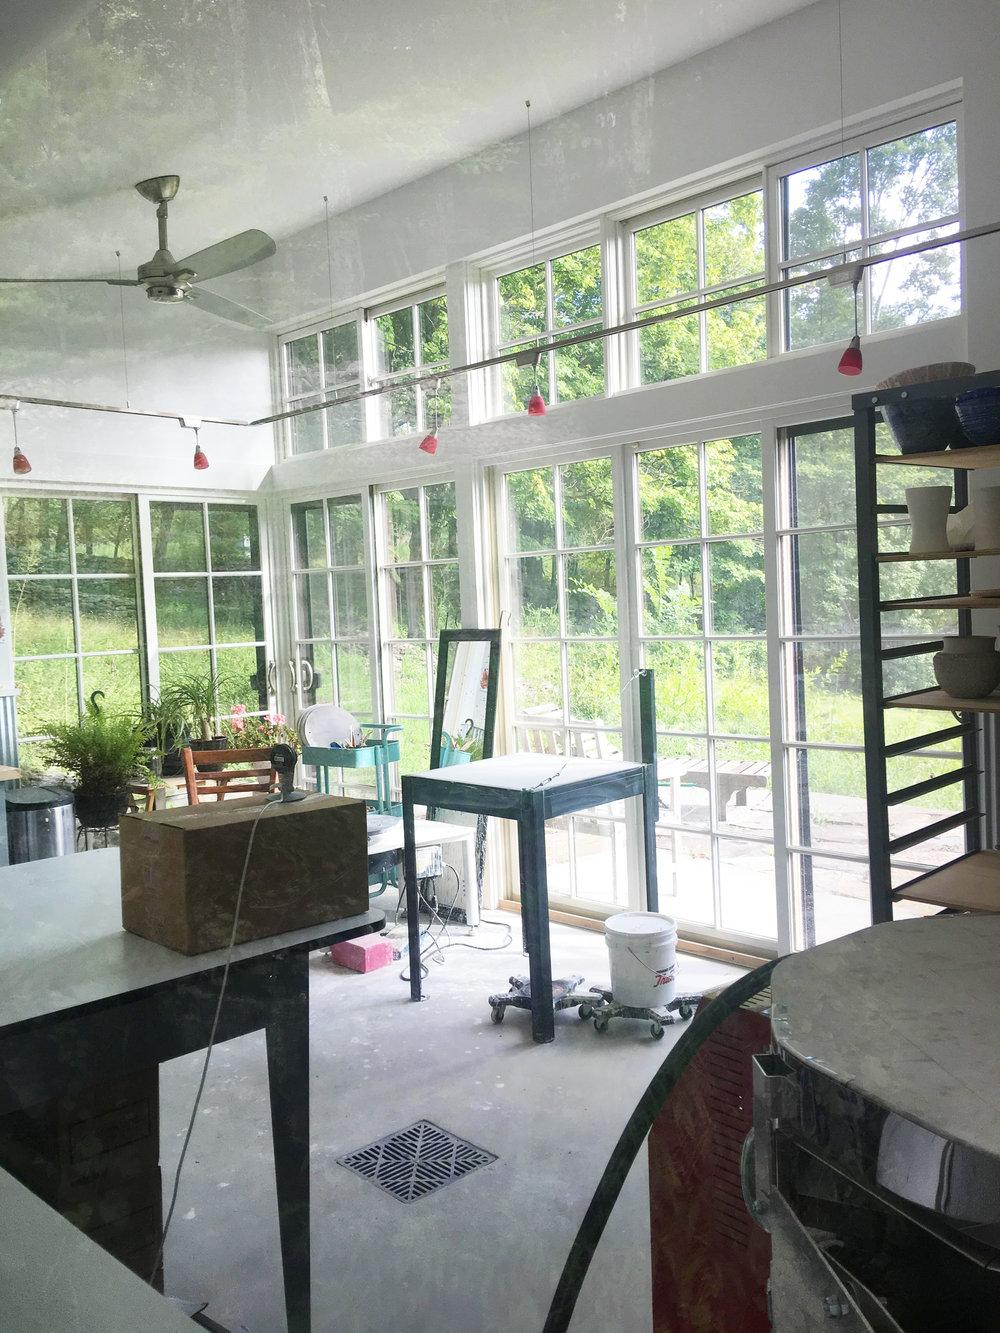 Pottery Studio - Krumville, NY